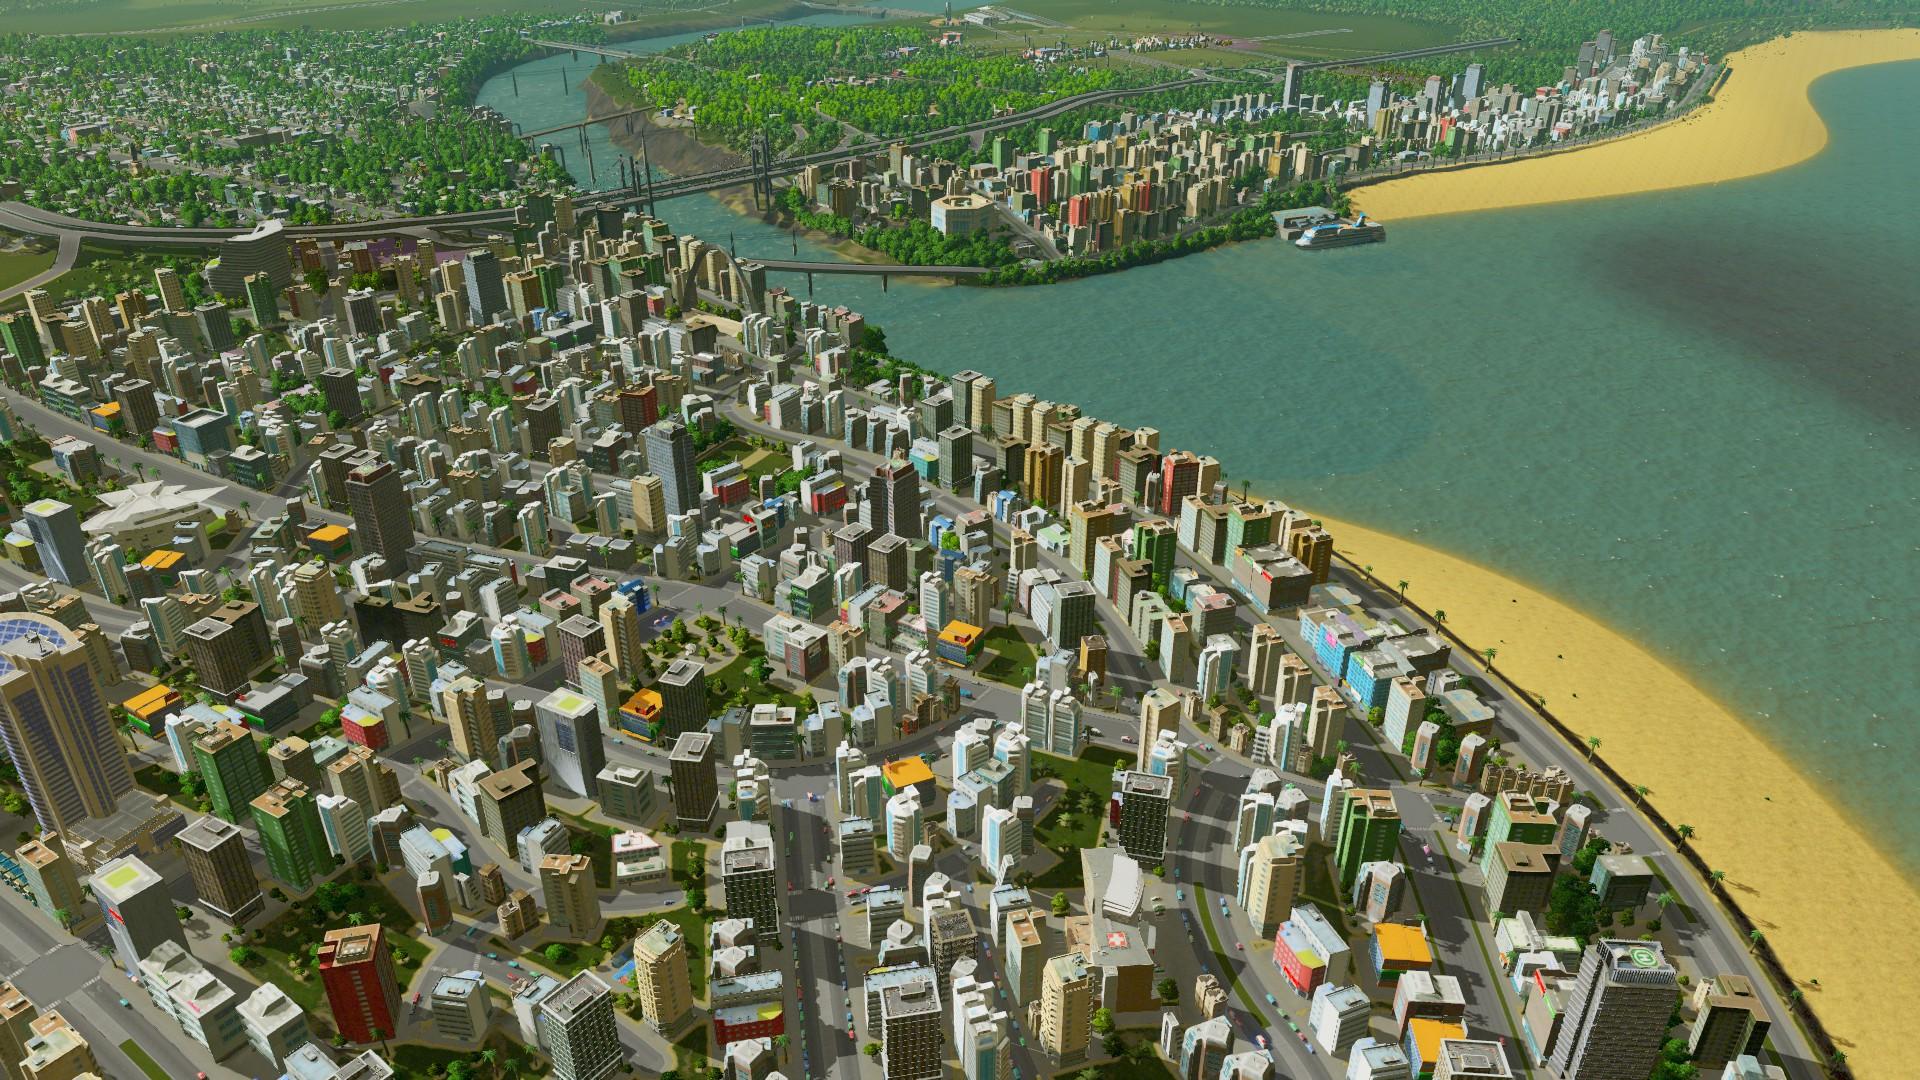 Amazon com: Cities: Skylines - DELUXE EDITION [Online Game